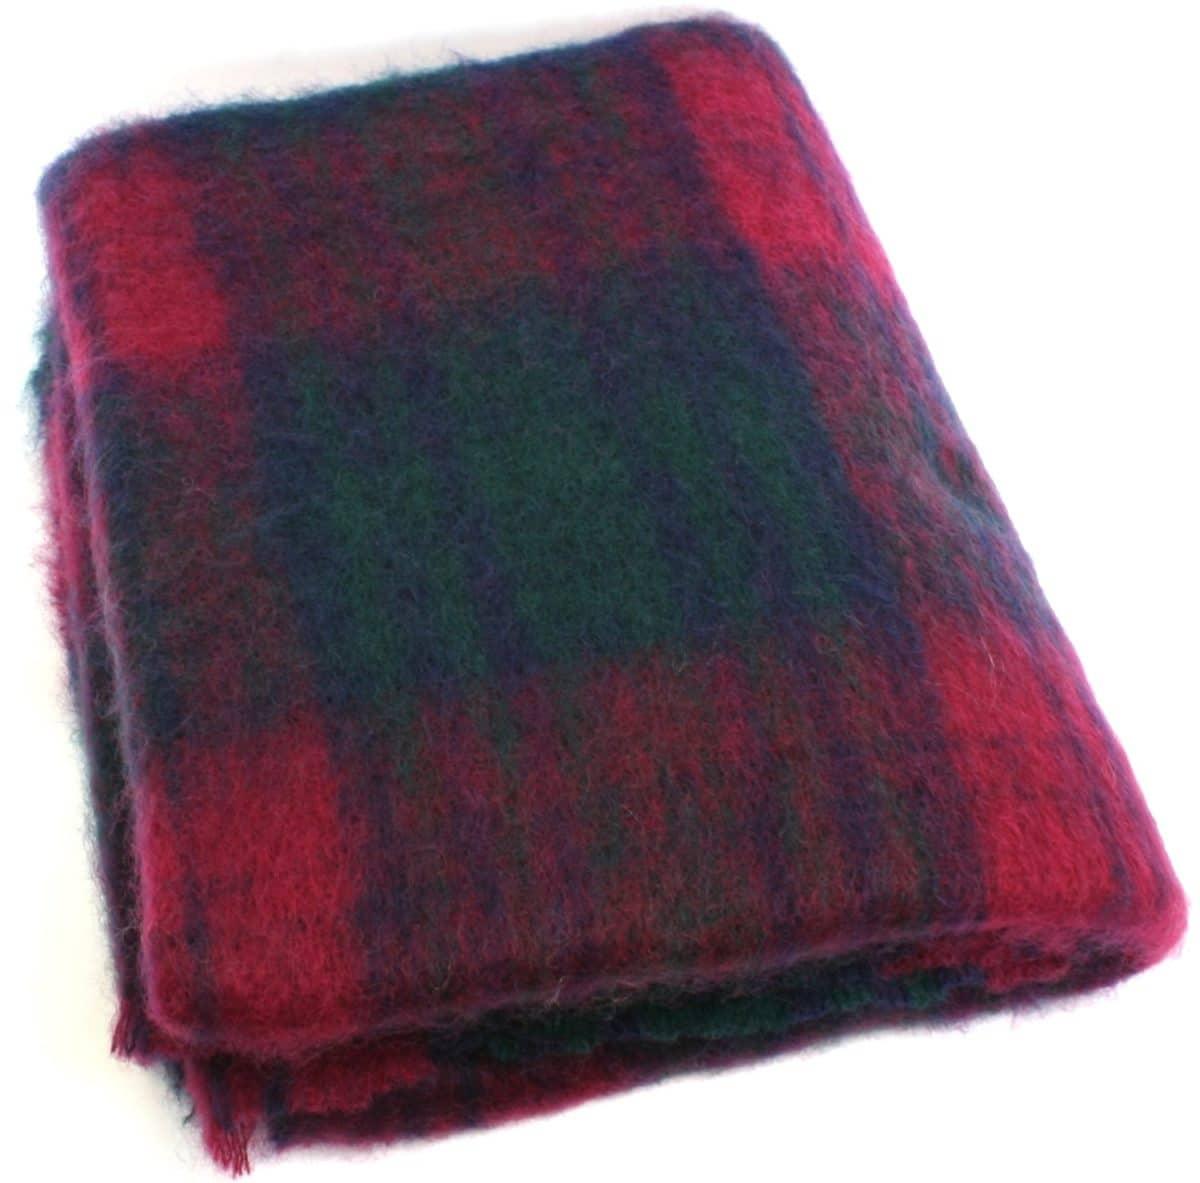 Mohair Blanket - Red Green